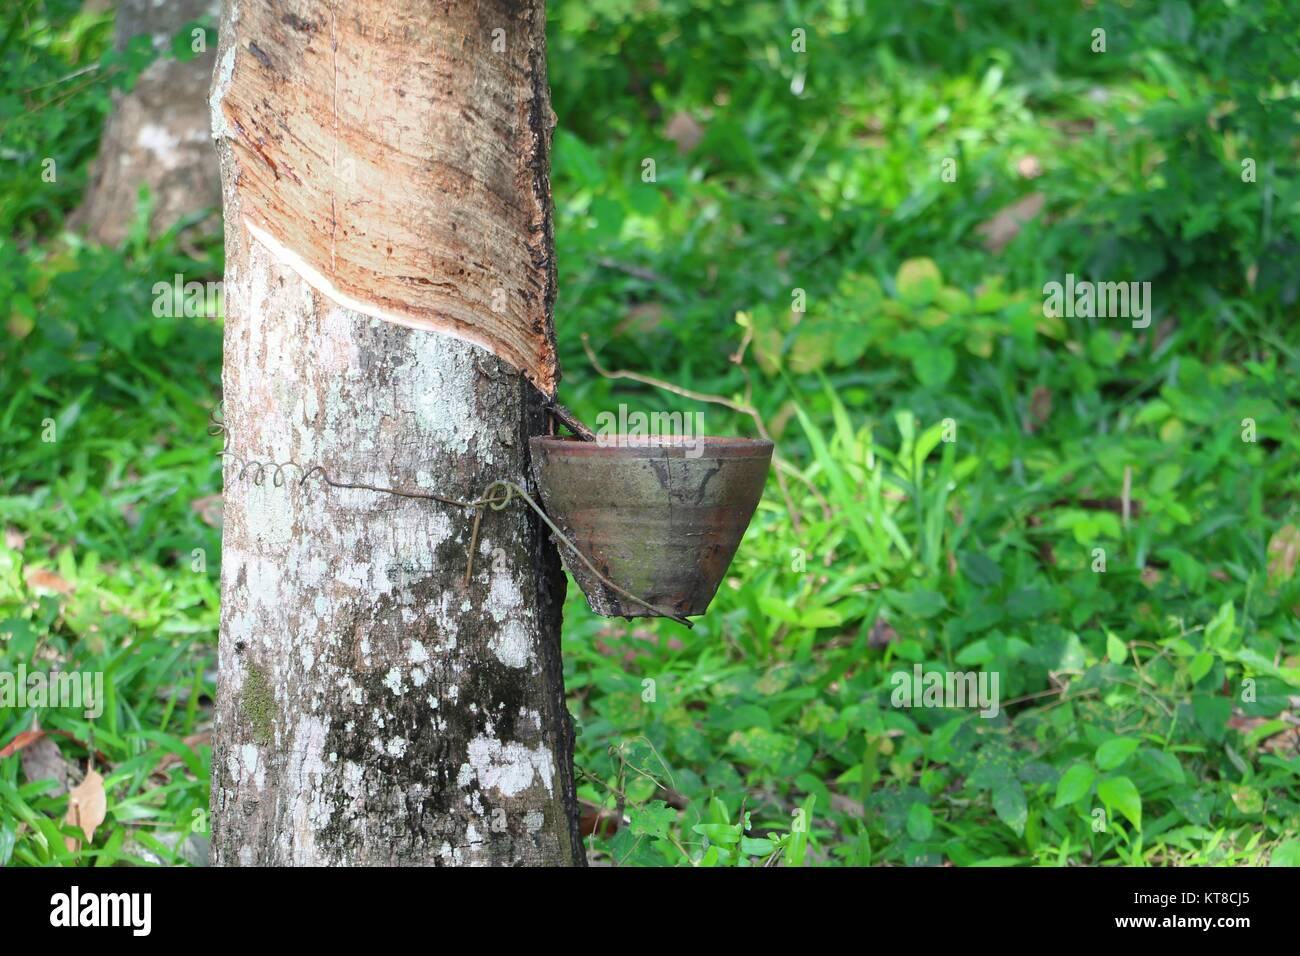 Gummi Baum Im Garten Natur Stockfoto Bild 169830589 Alamy